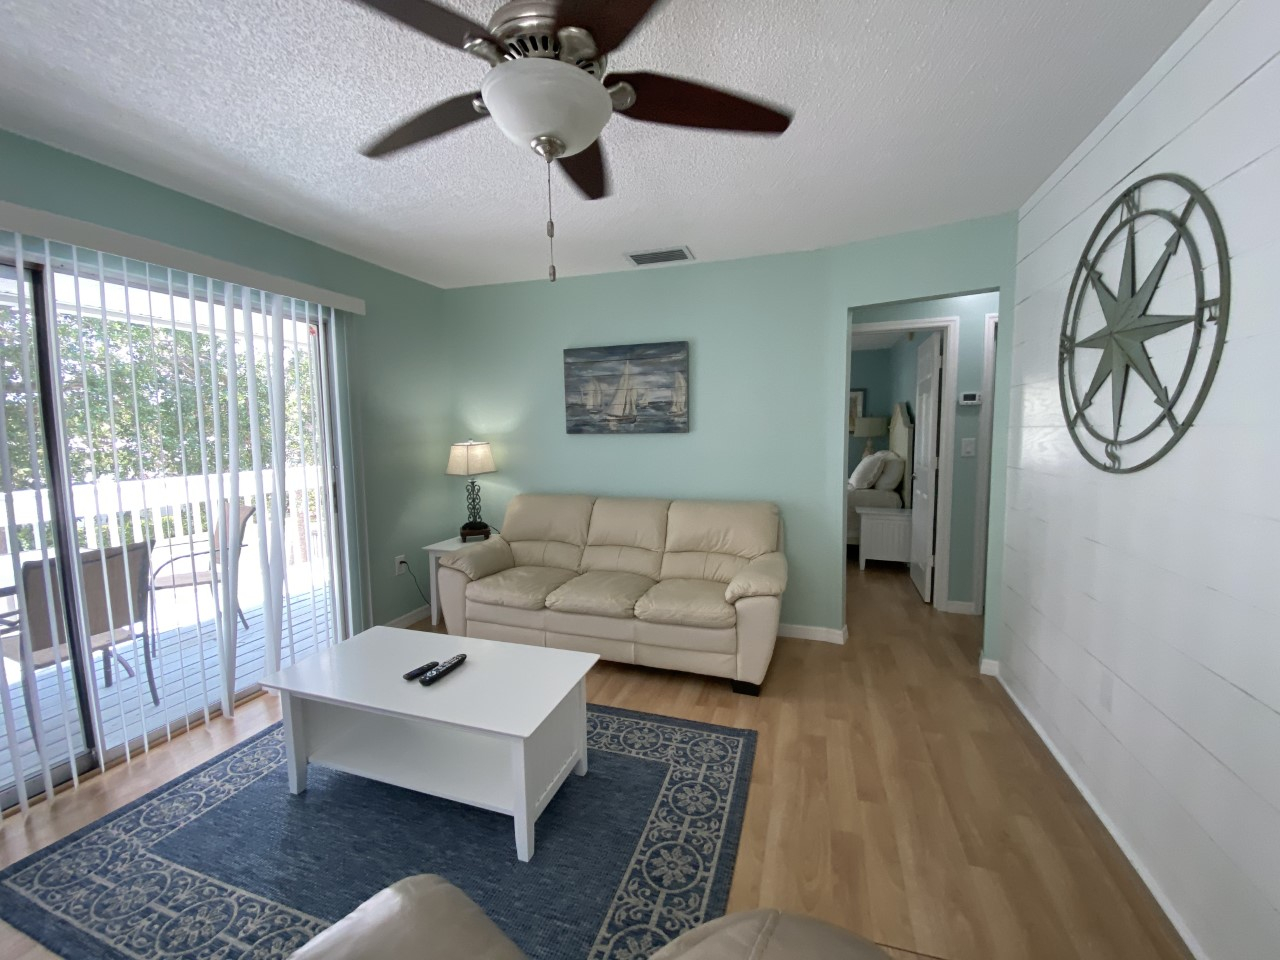 Bahama Bungalow in Siesta Key Village - Siesta Key Vacation Rentals